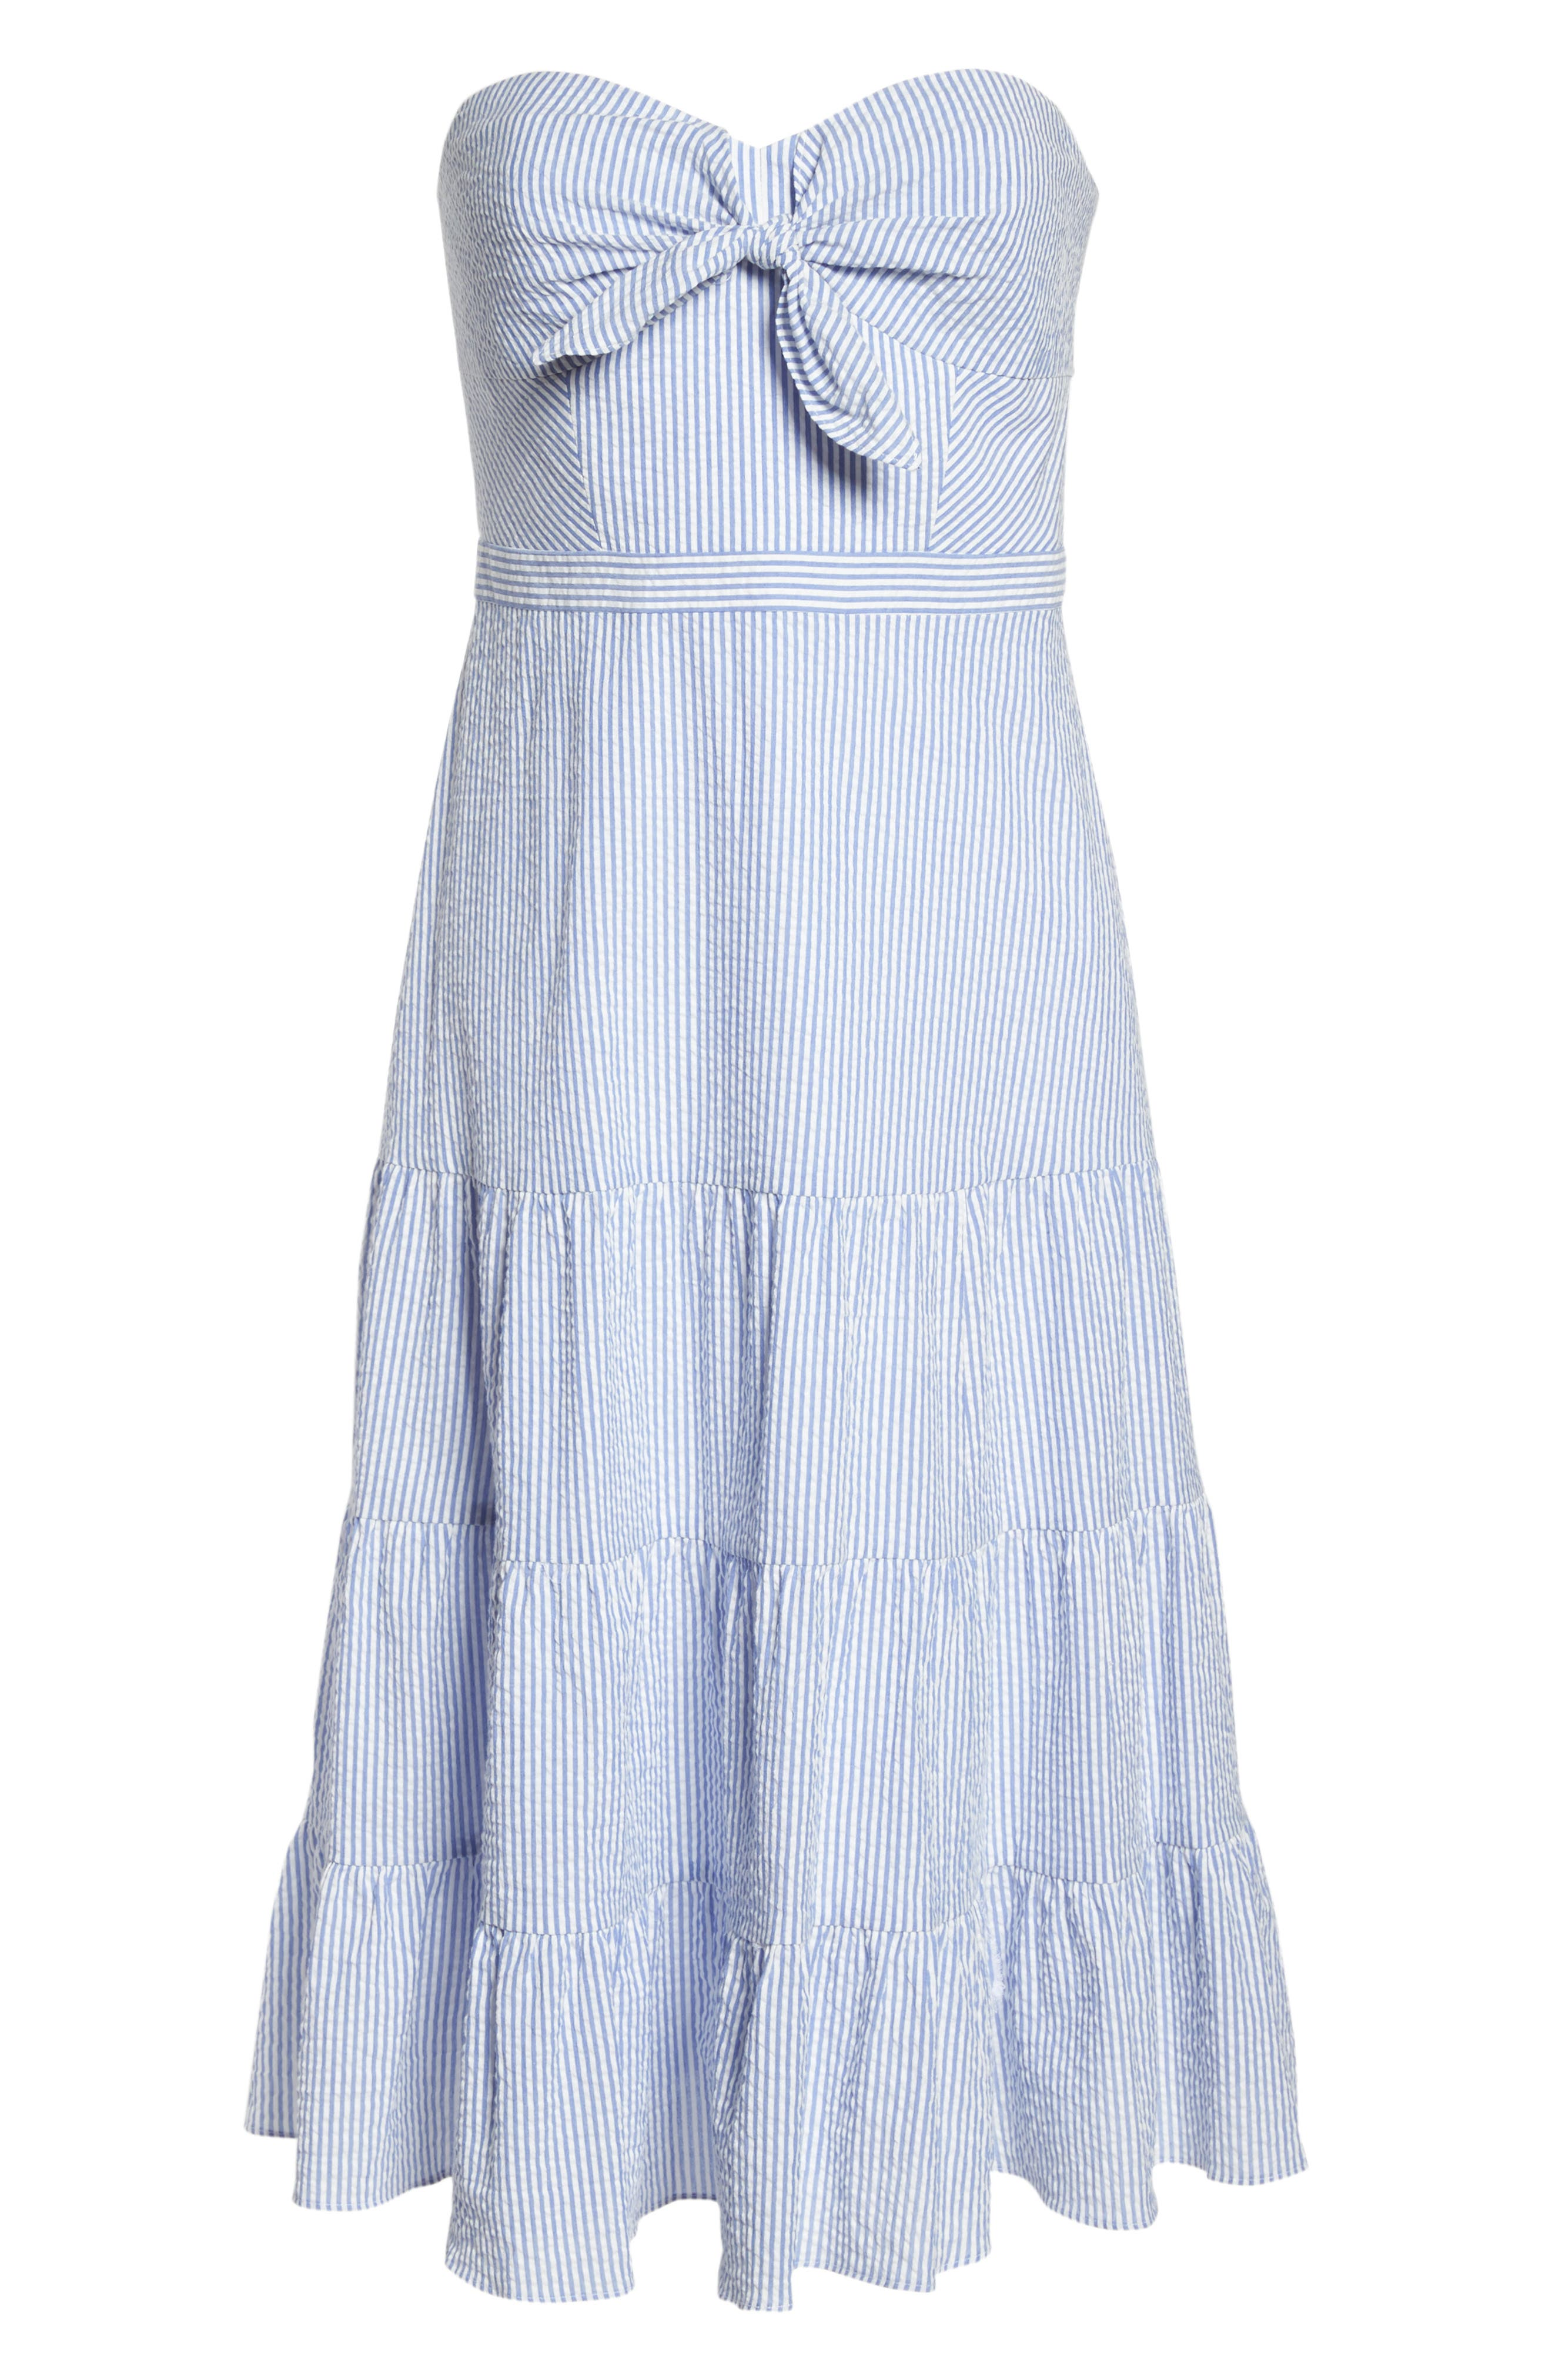 Tie Front Strapless Dress,                             Alternate thumbnail 12, color,